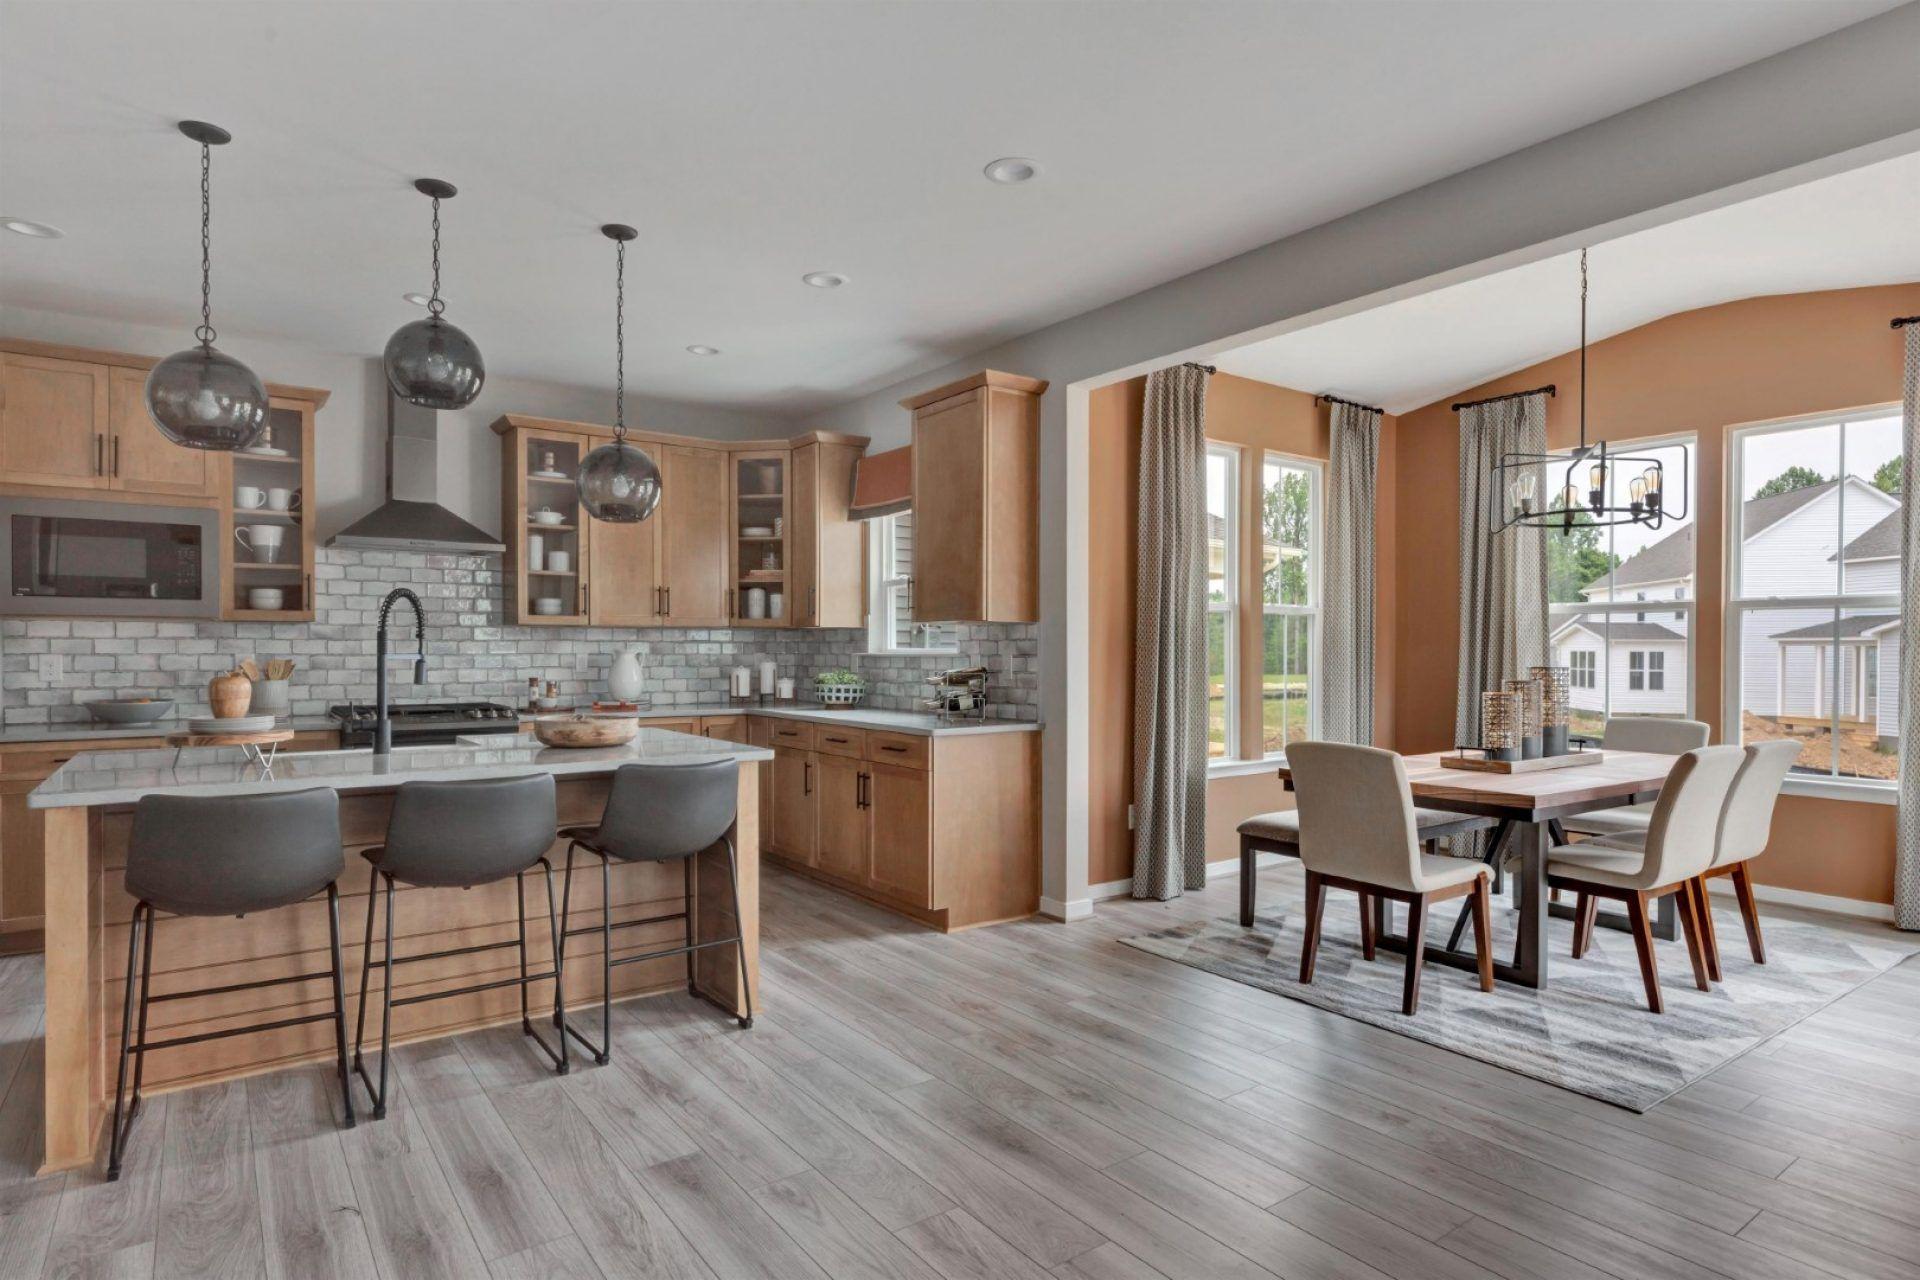 Kitchen featured in the Glenwood By HHHunt Homes LLC in Richmond-Petersburg, VA